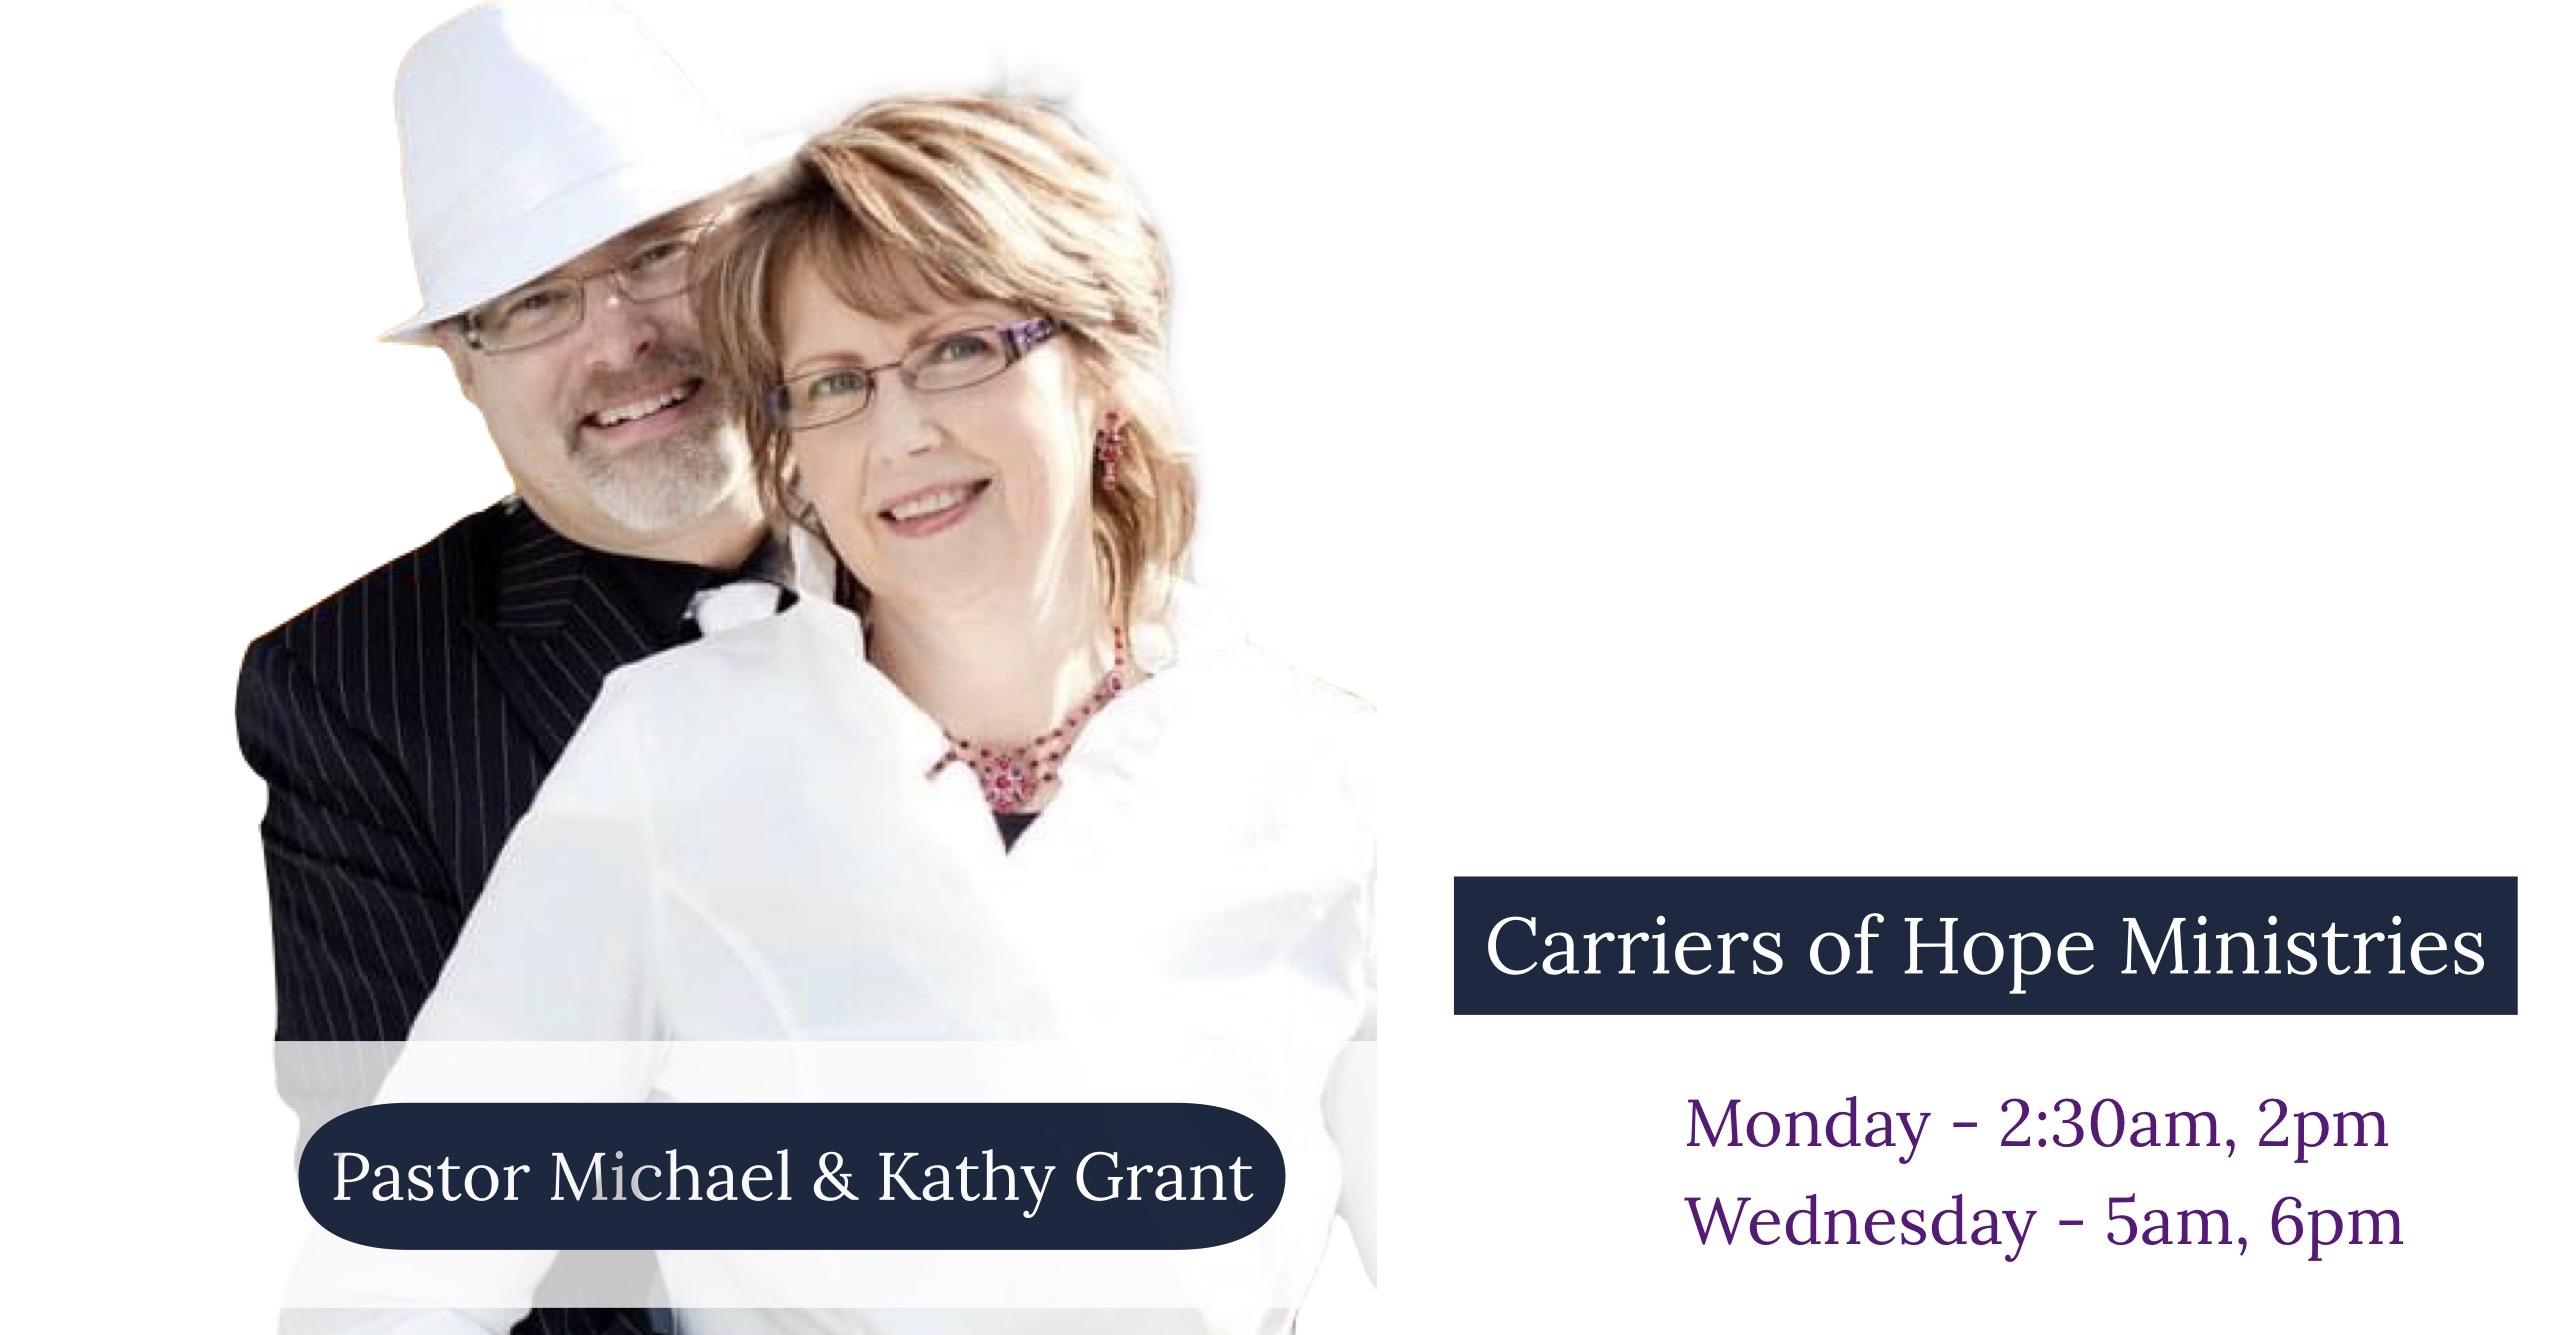 Pastor Michael & Kathy Grant